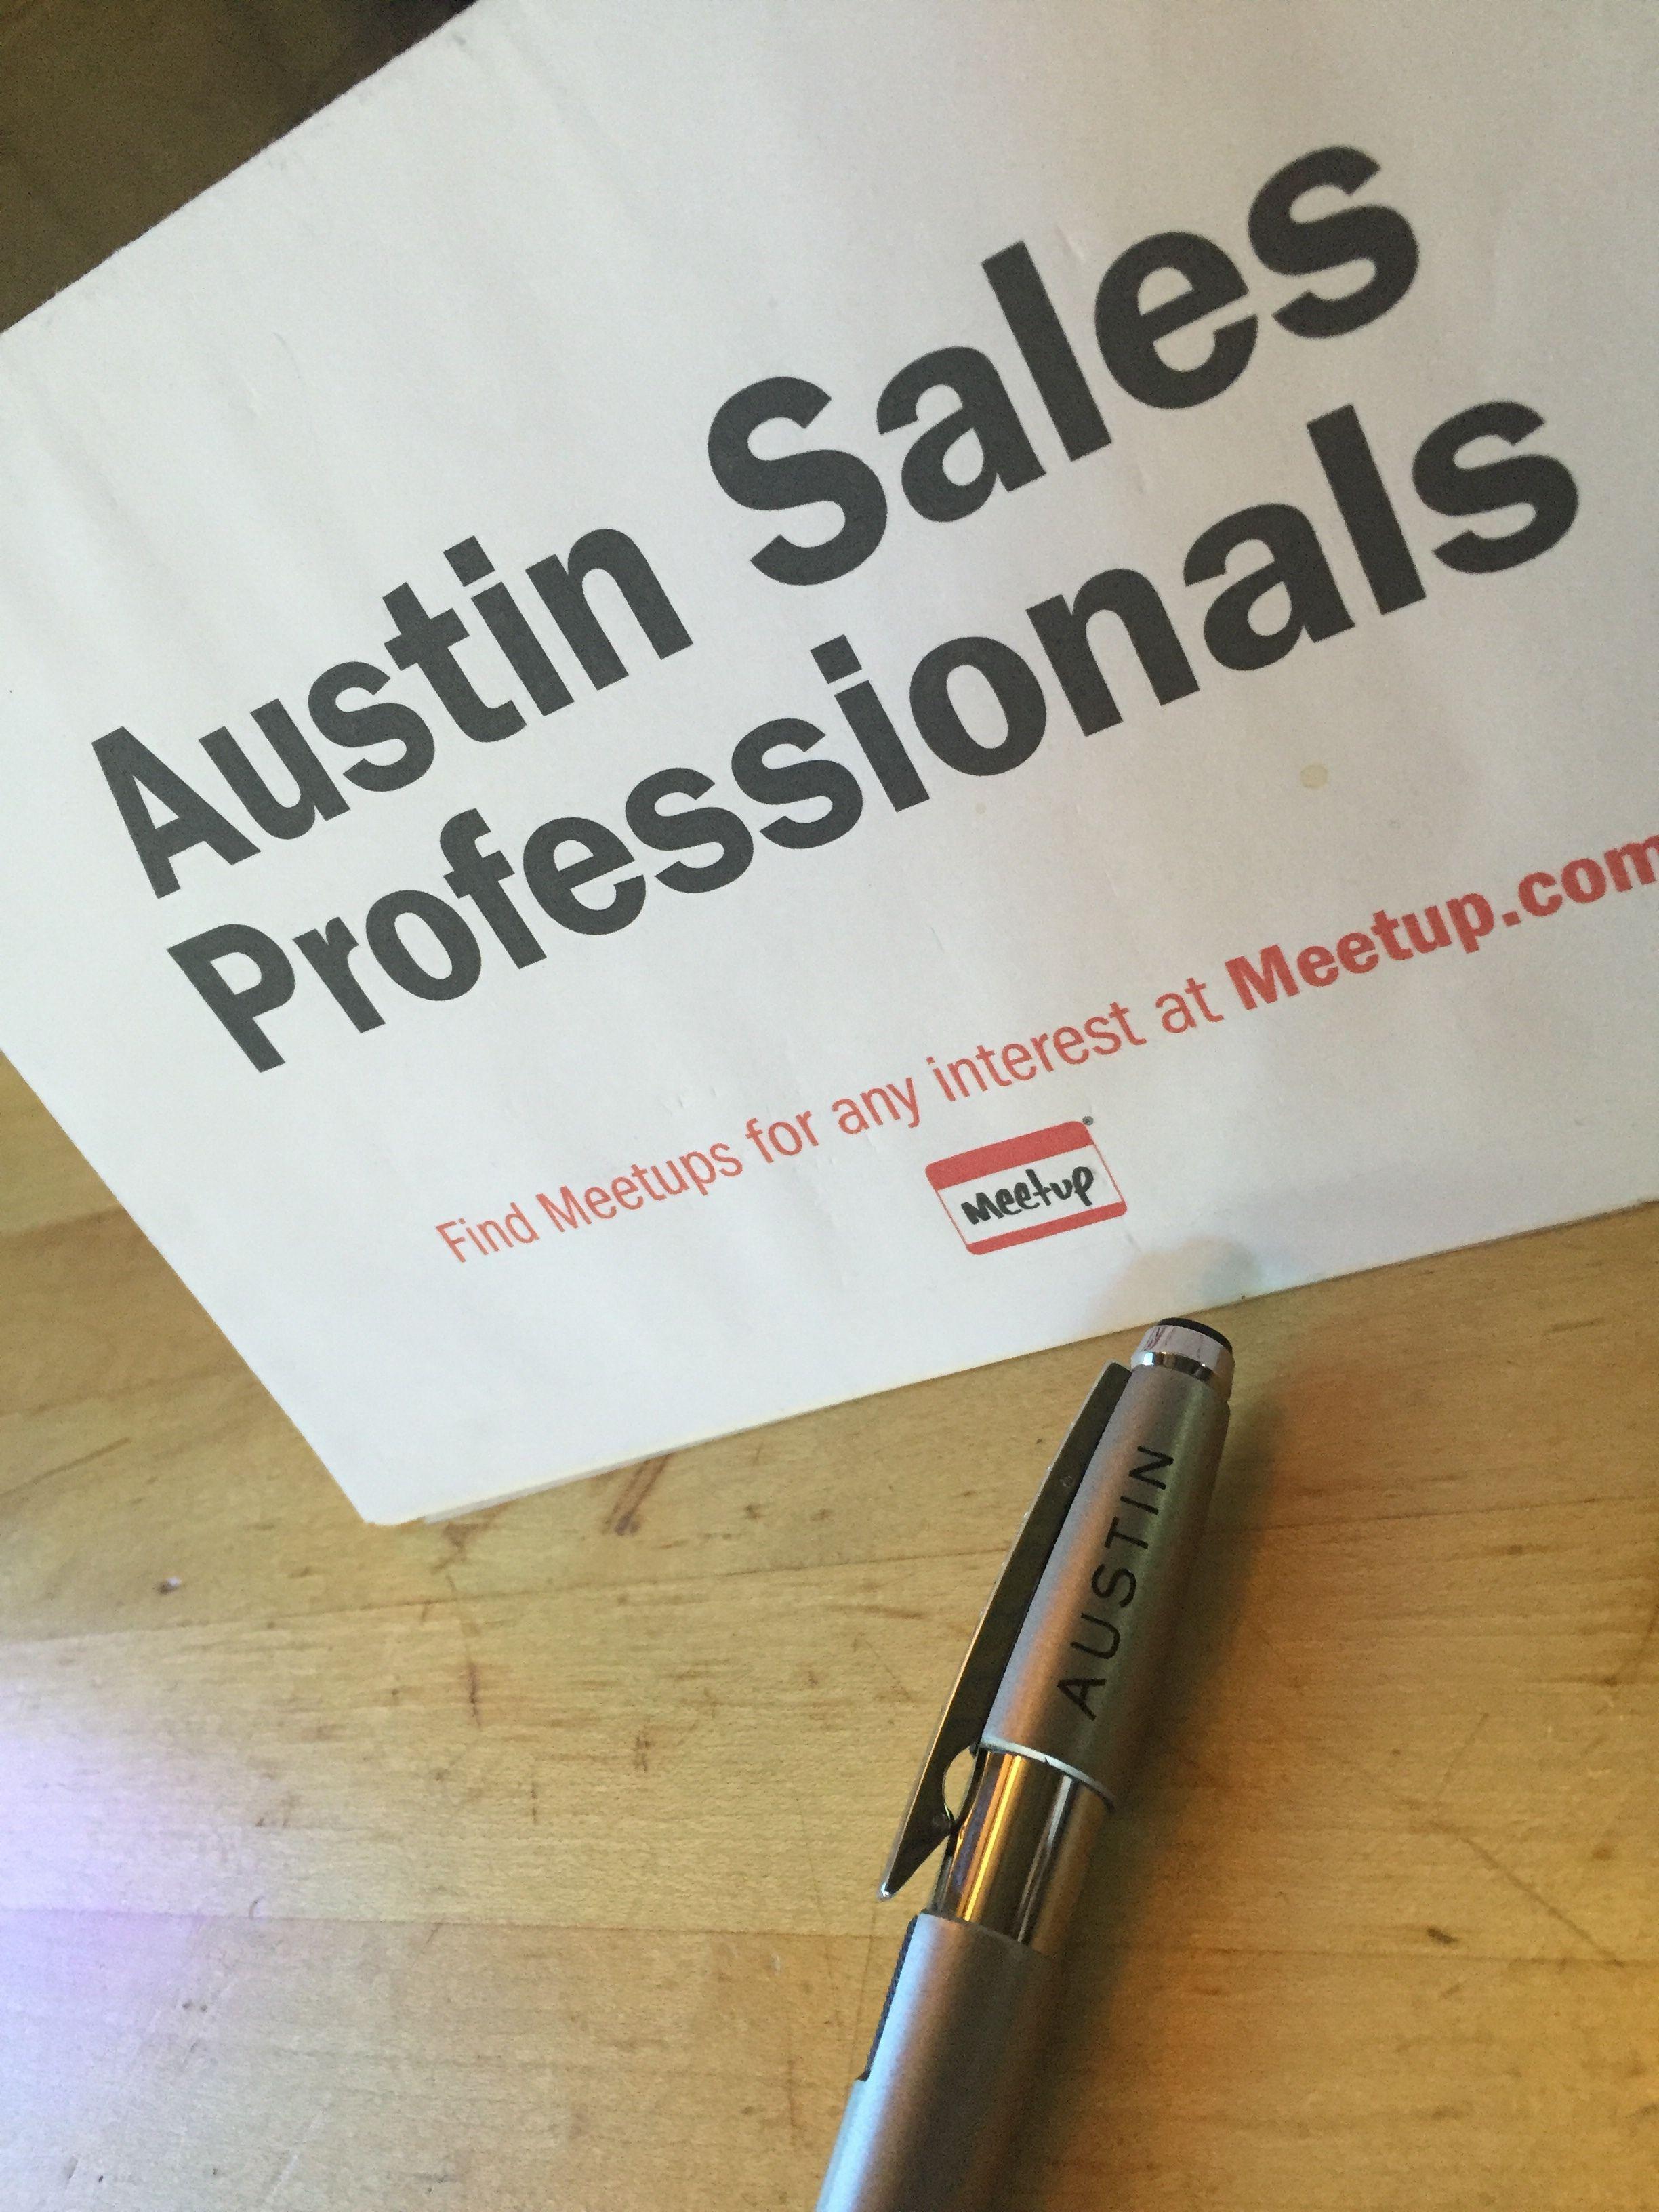 Austin Sales Professionals